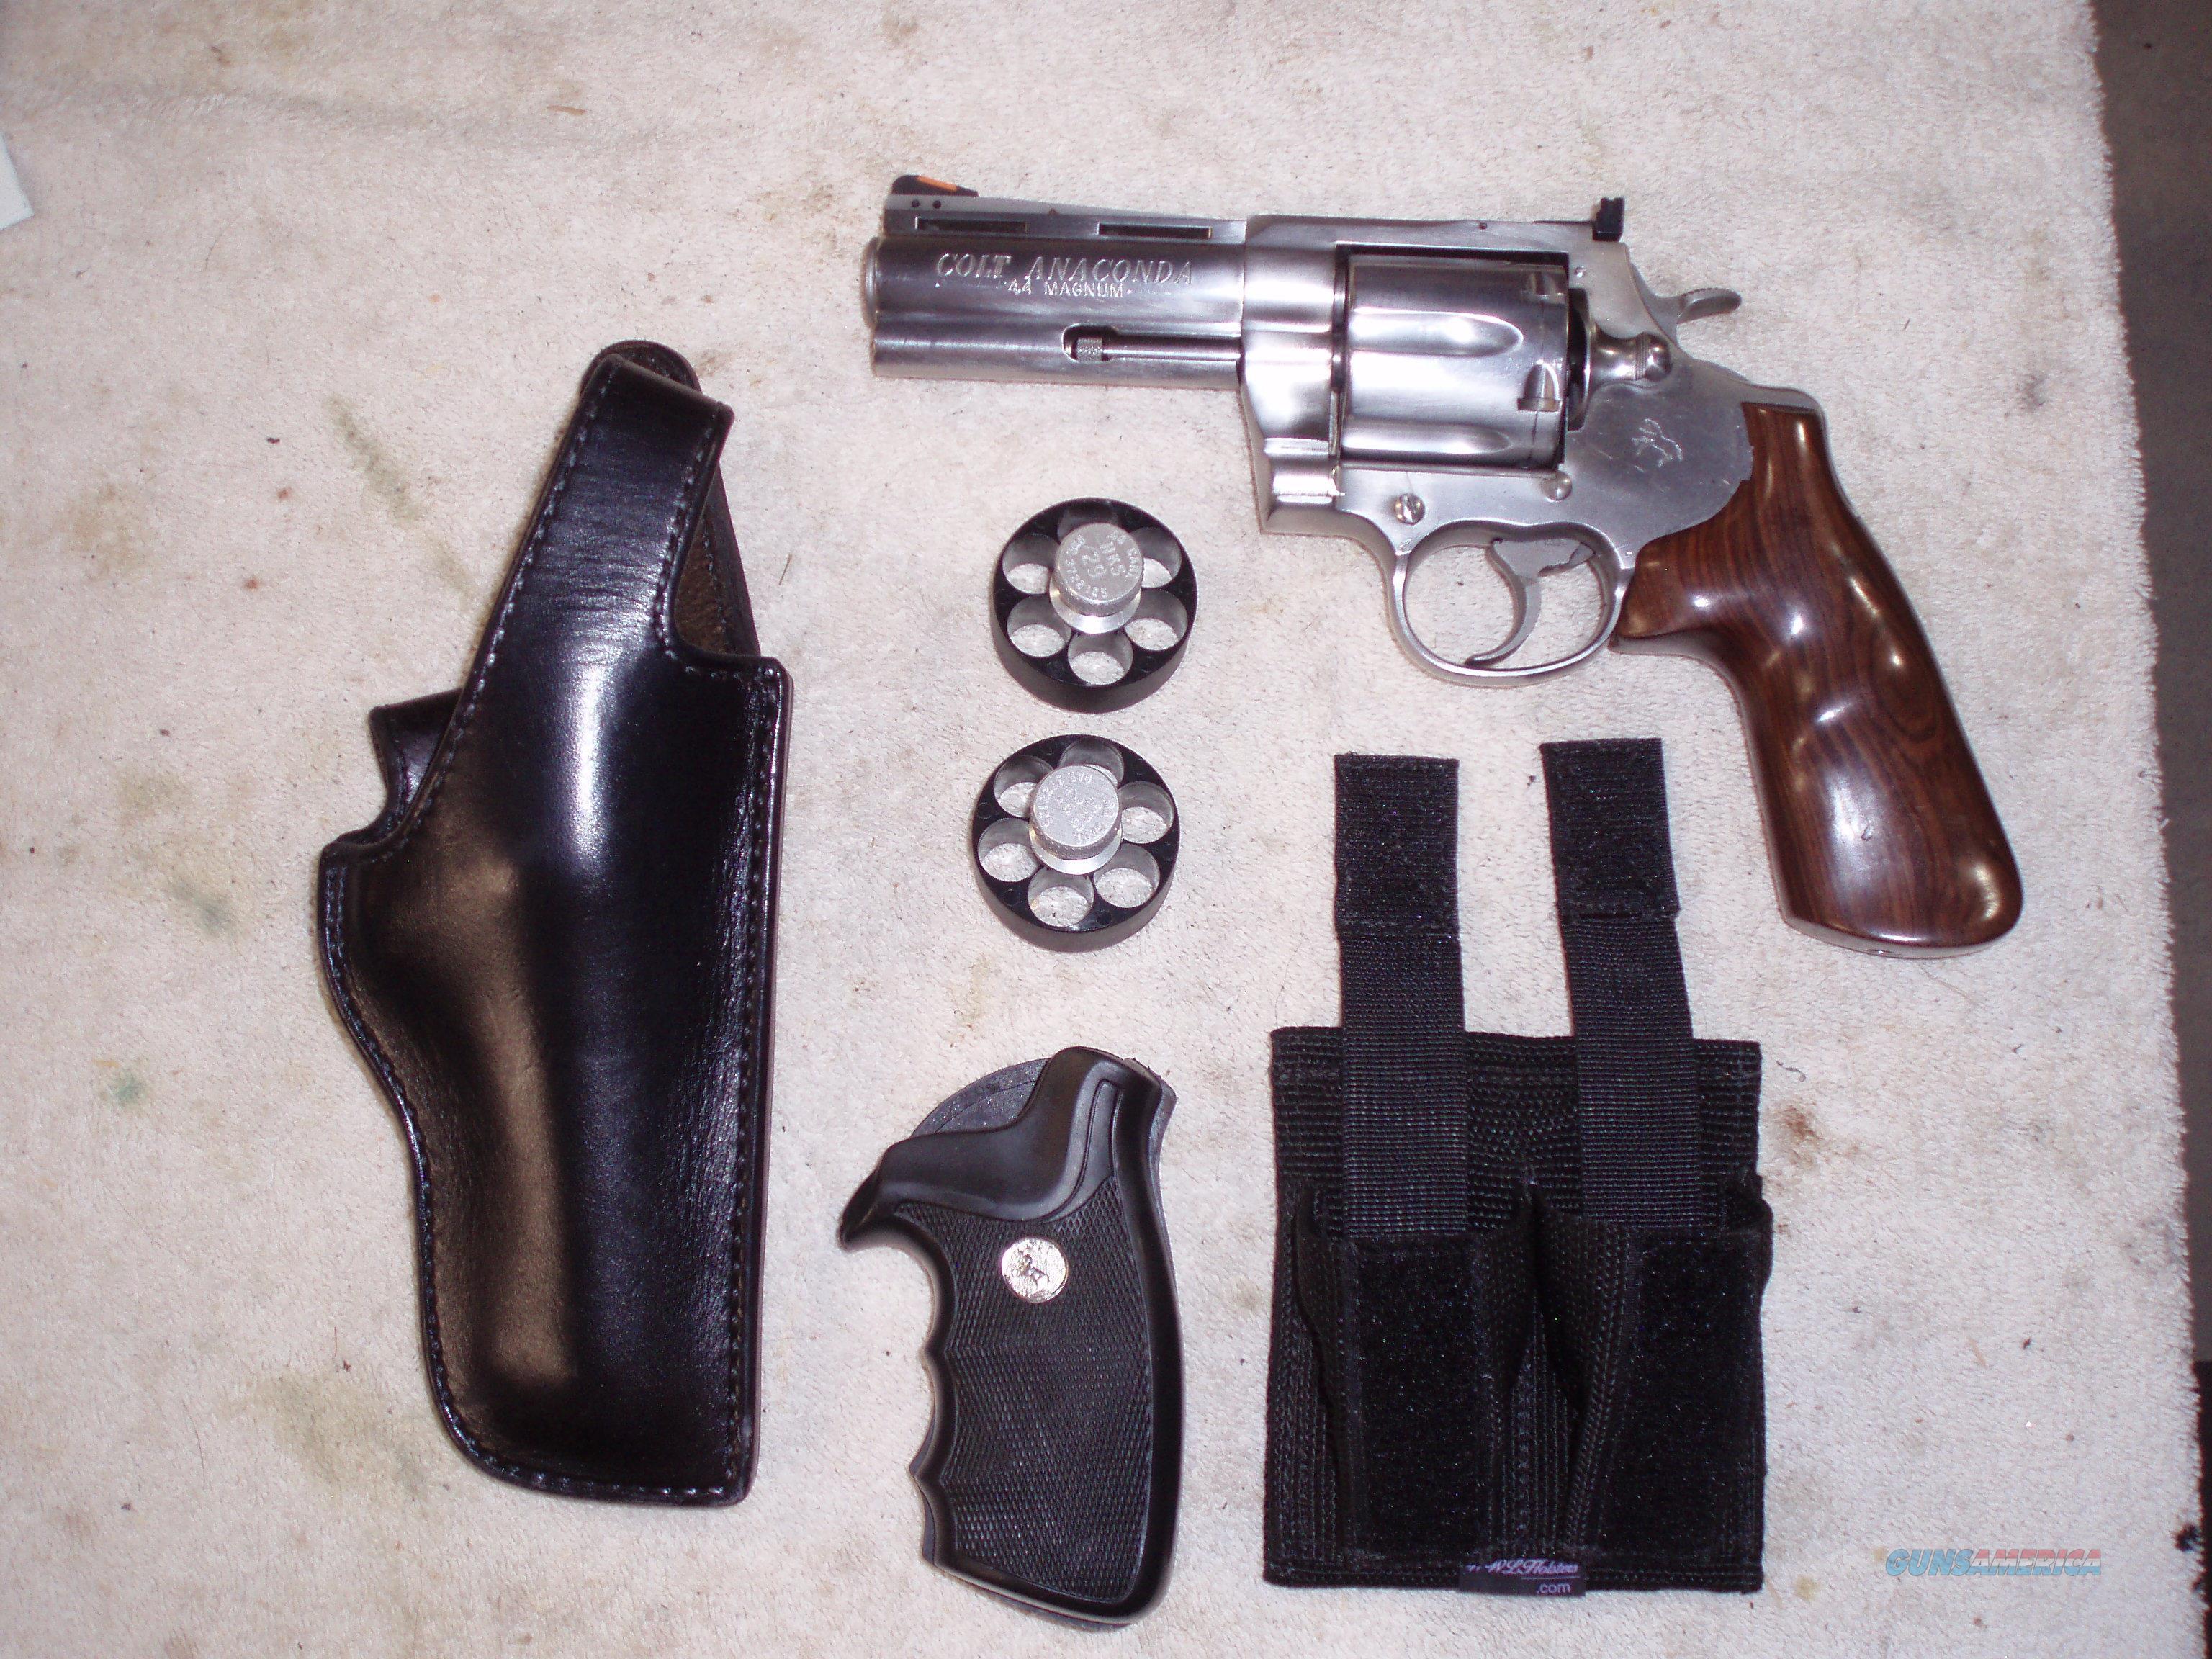 Colt Anaconda 45 Colt Stainless For Sale   HD Wallpaper 4K